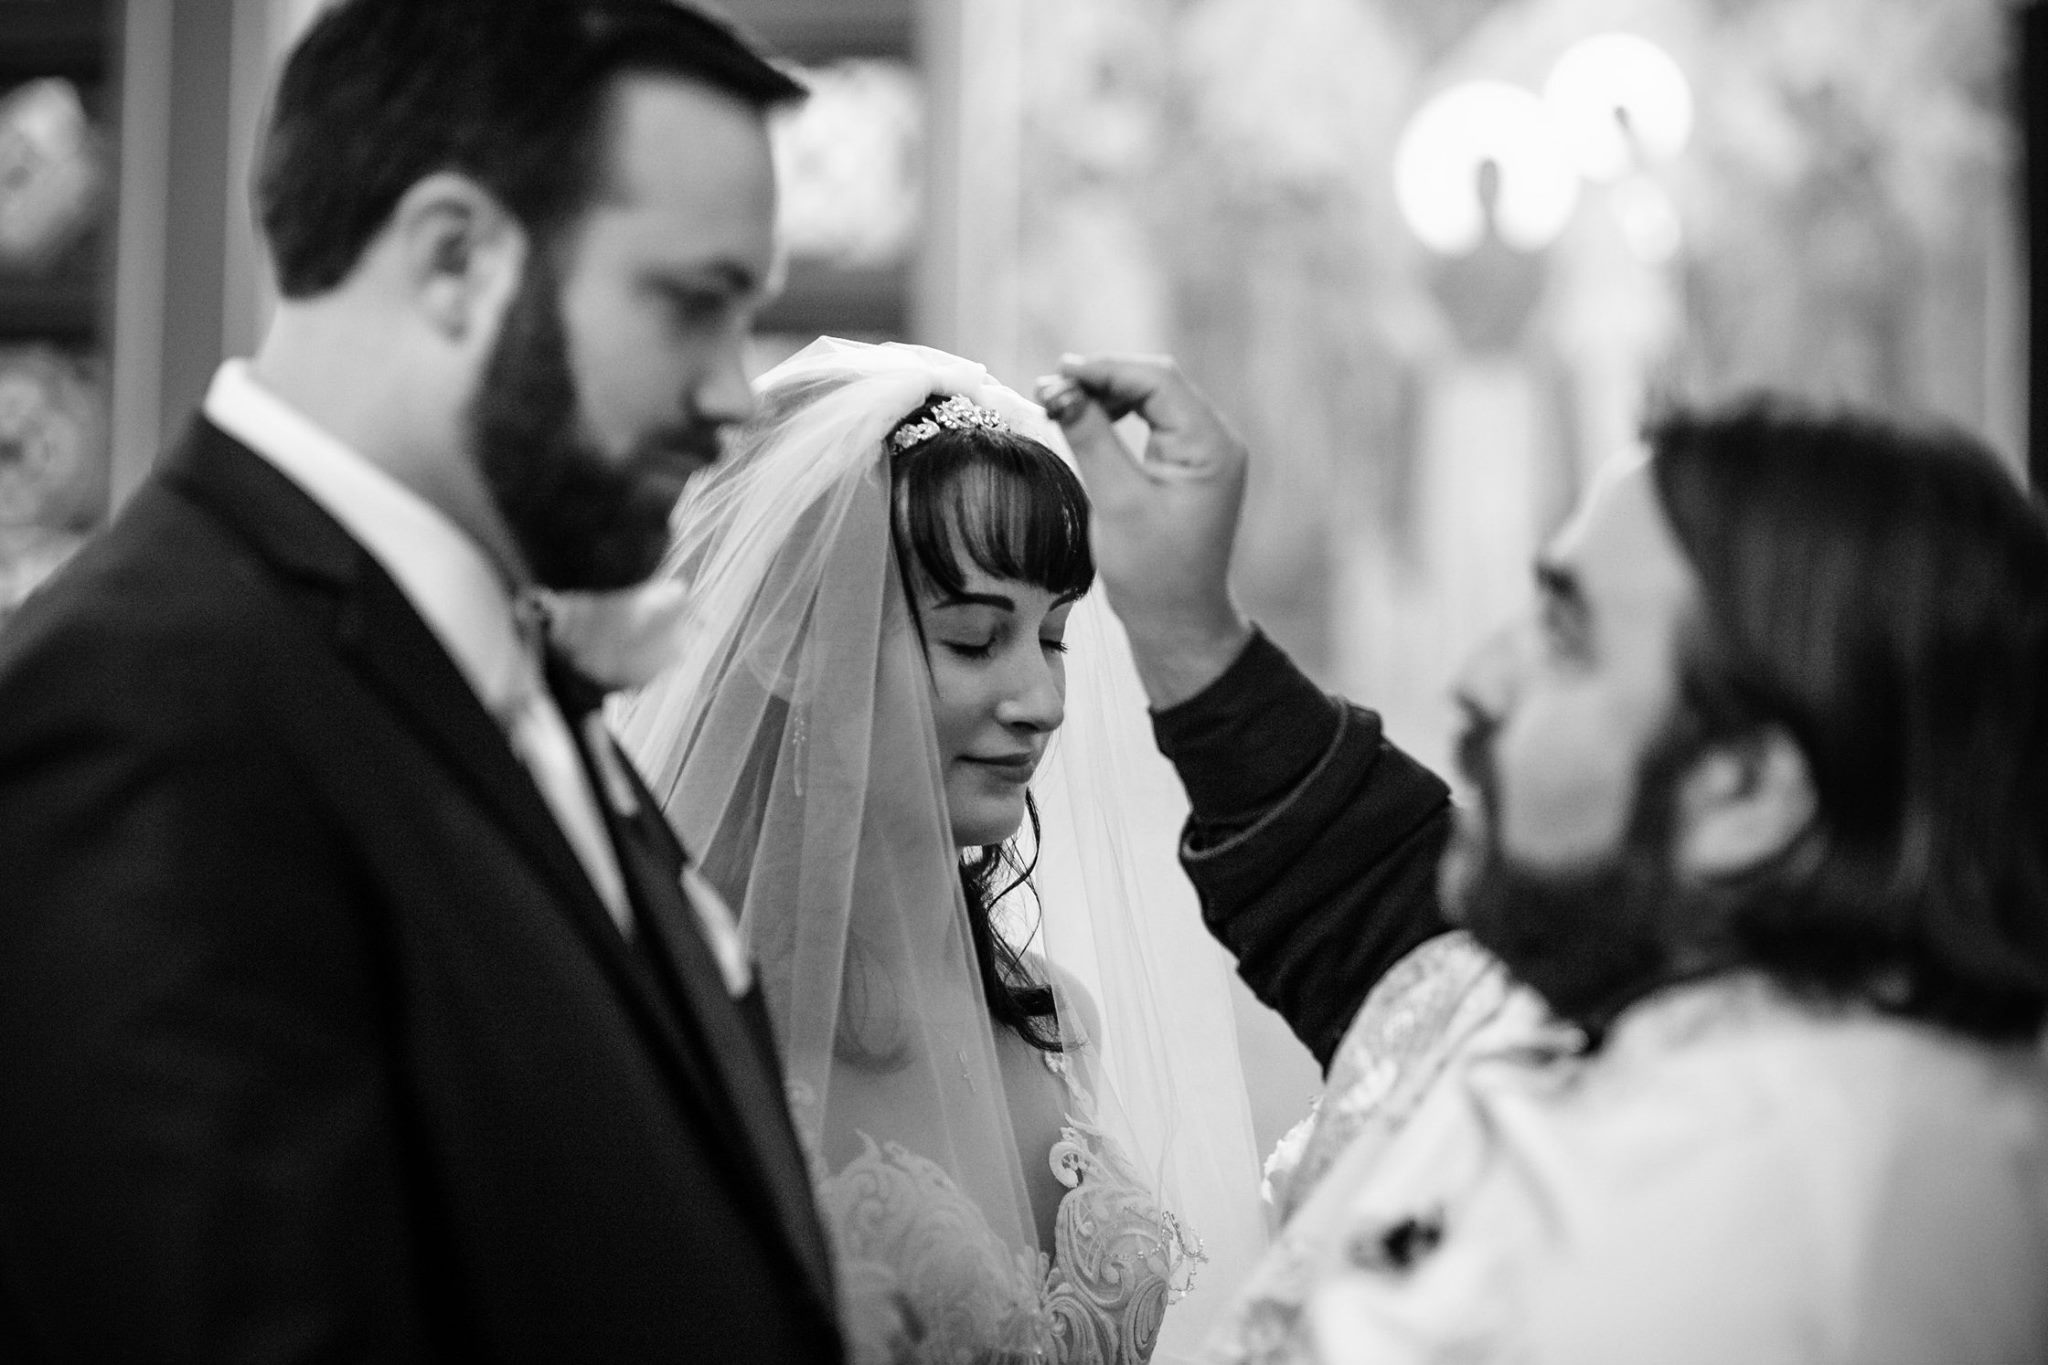 greek wedding ceremony.jpg